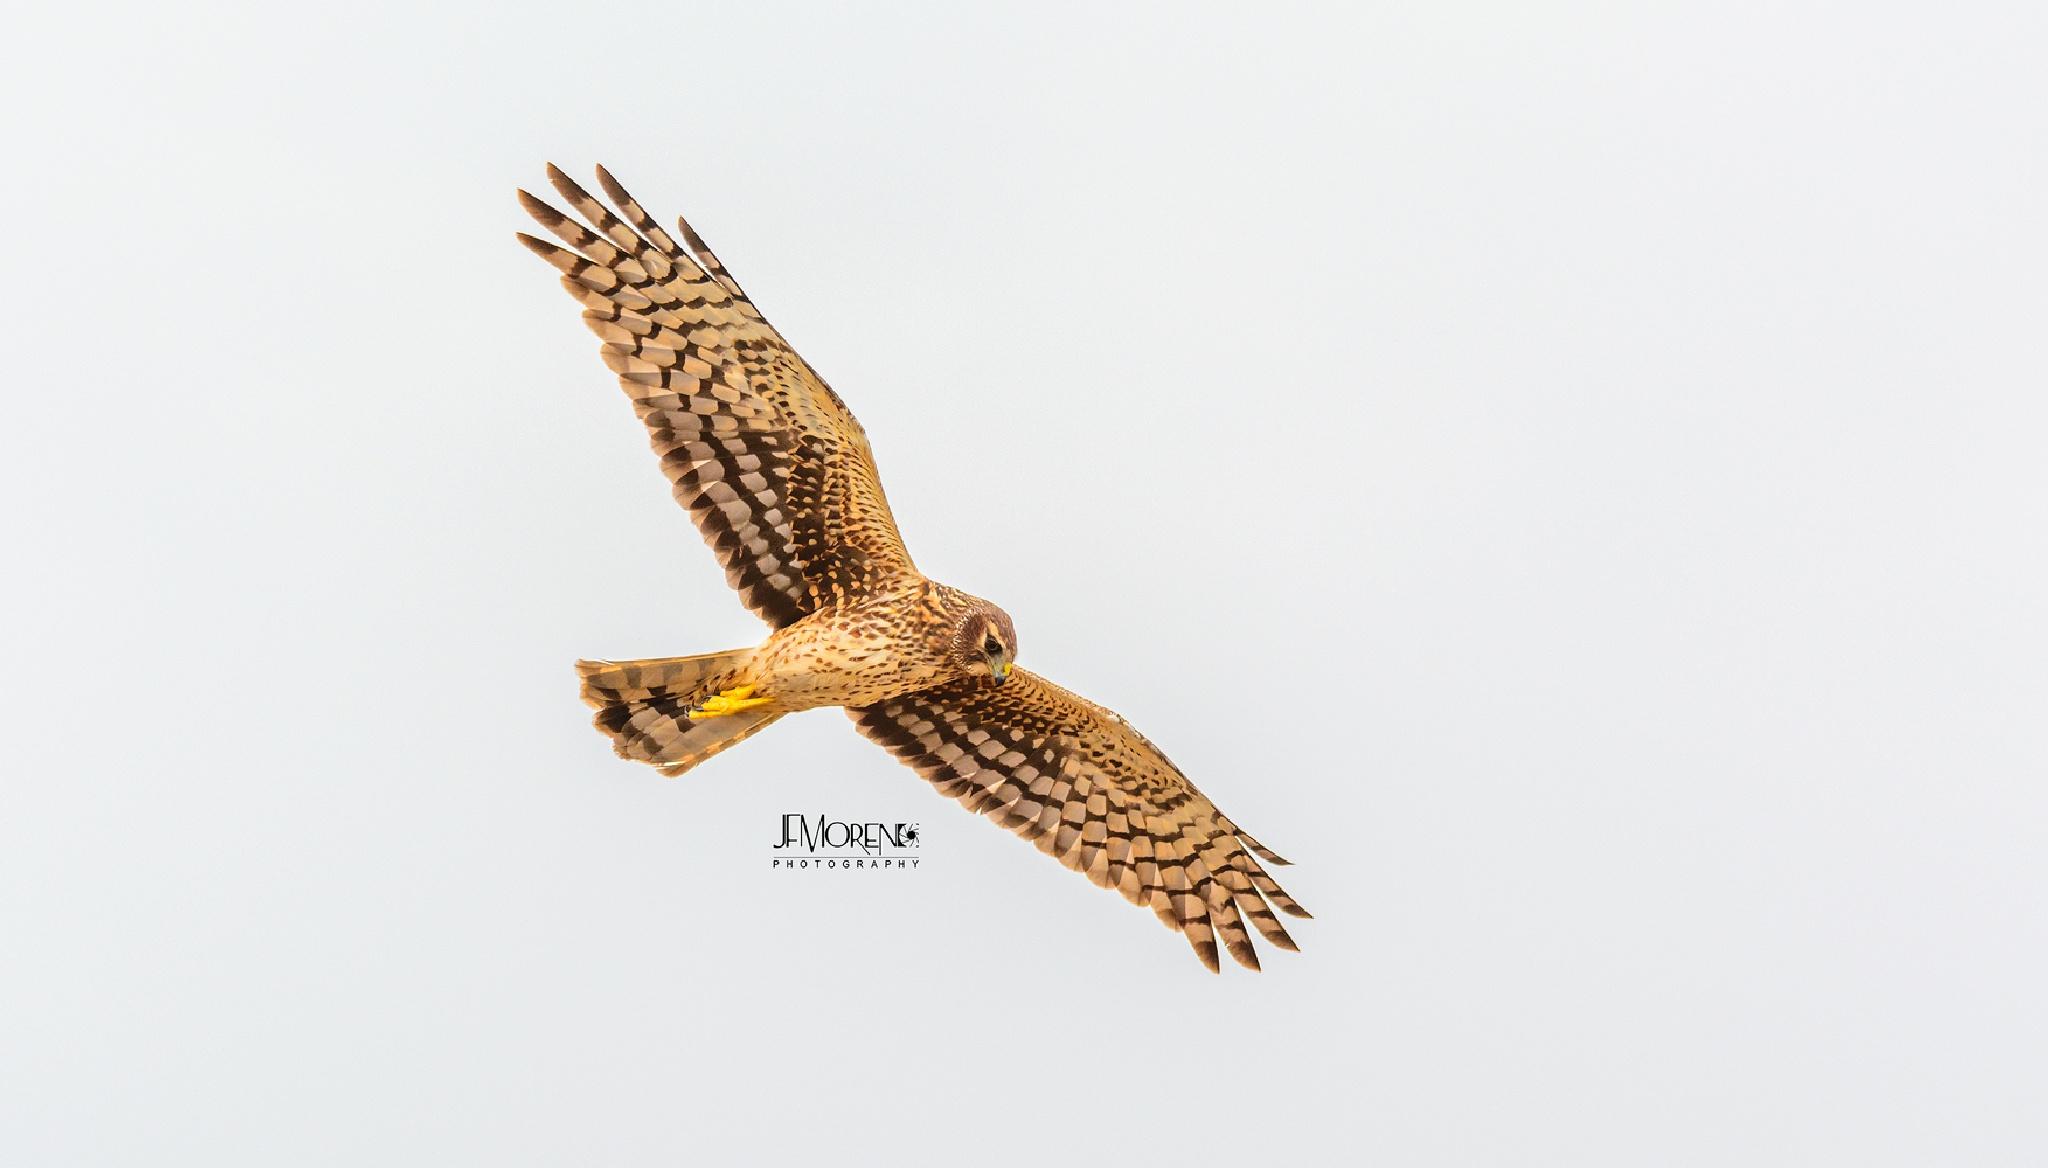 Northern Harrier by Jesus Moreno